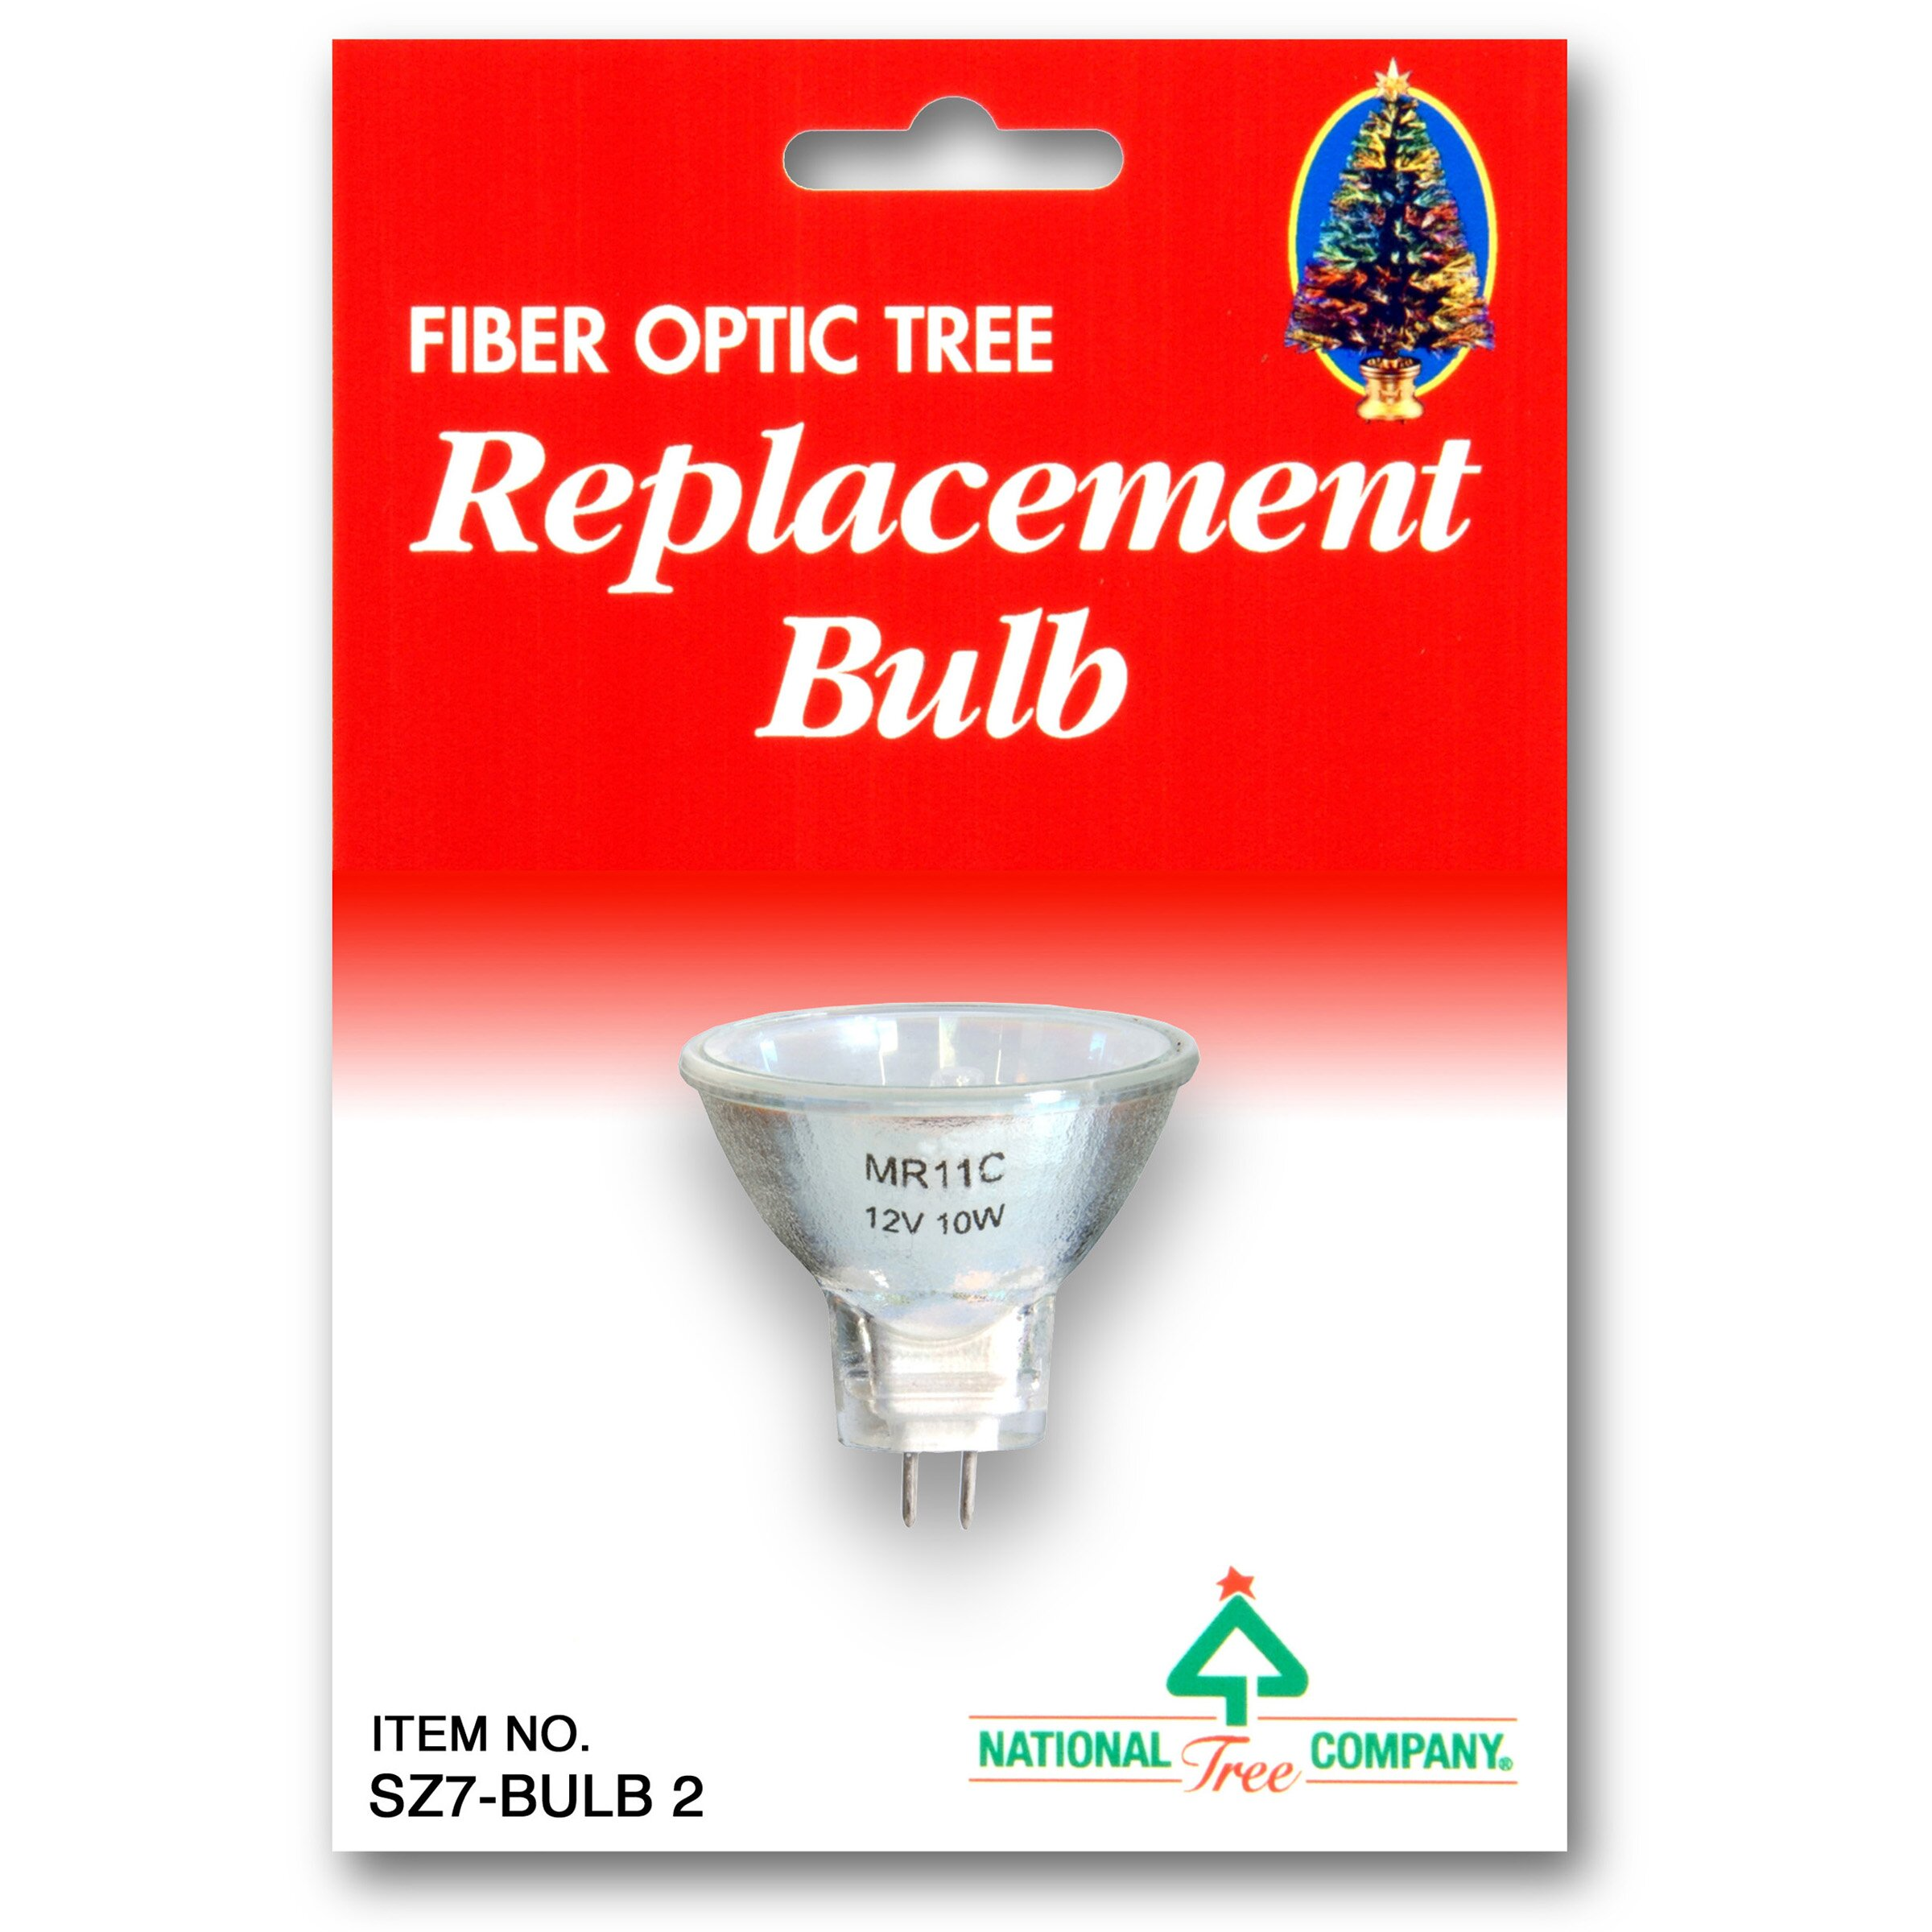 National Tree Co. Fiber Optic Halogen Replacement Bulb